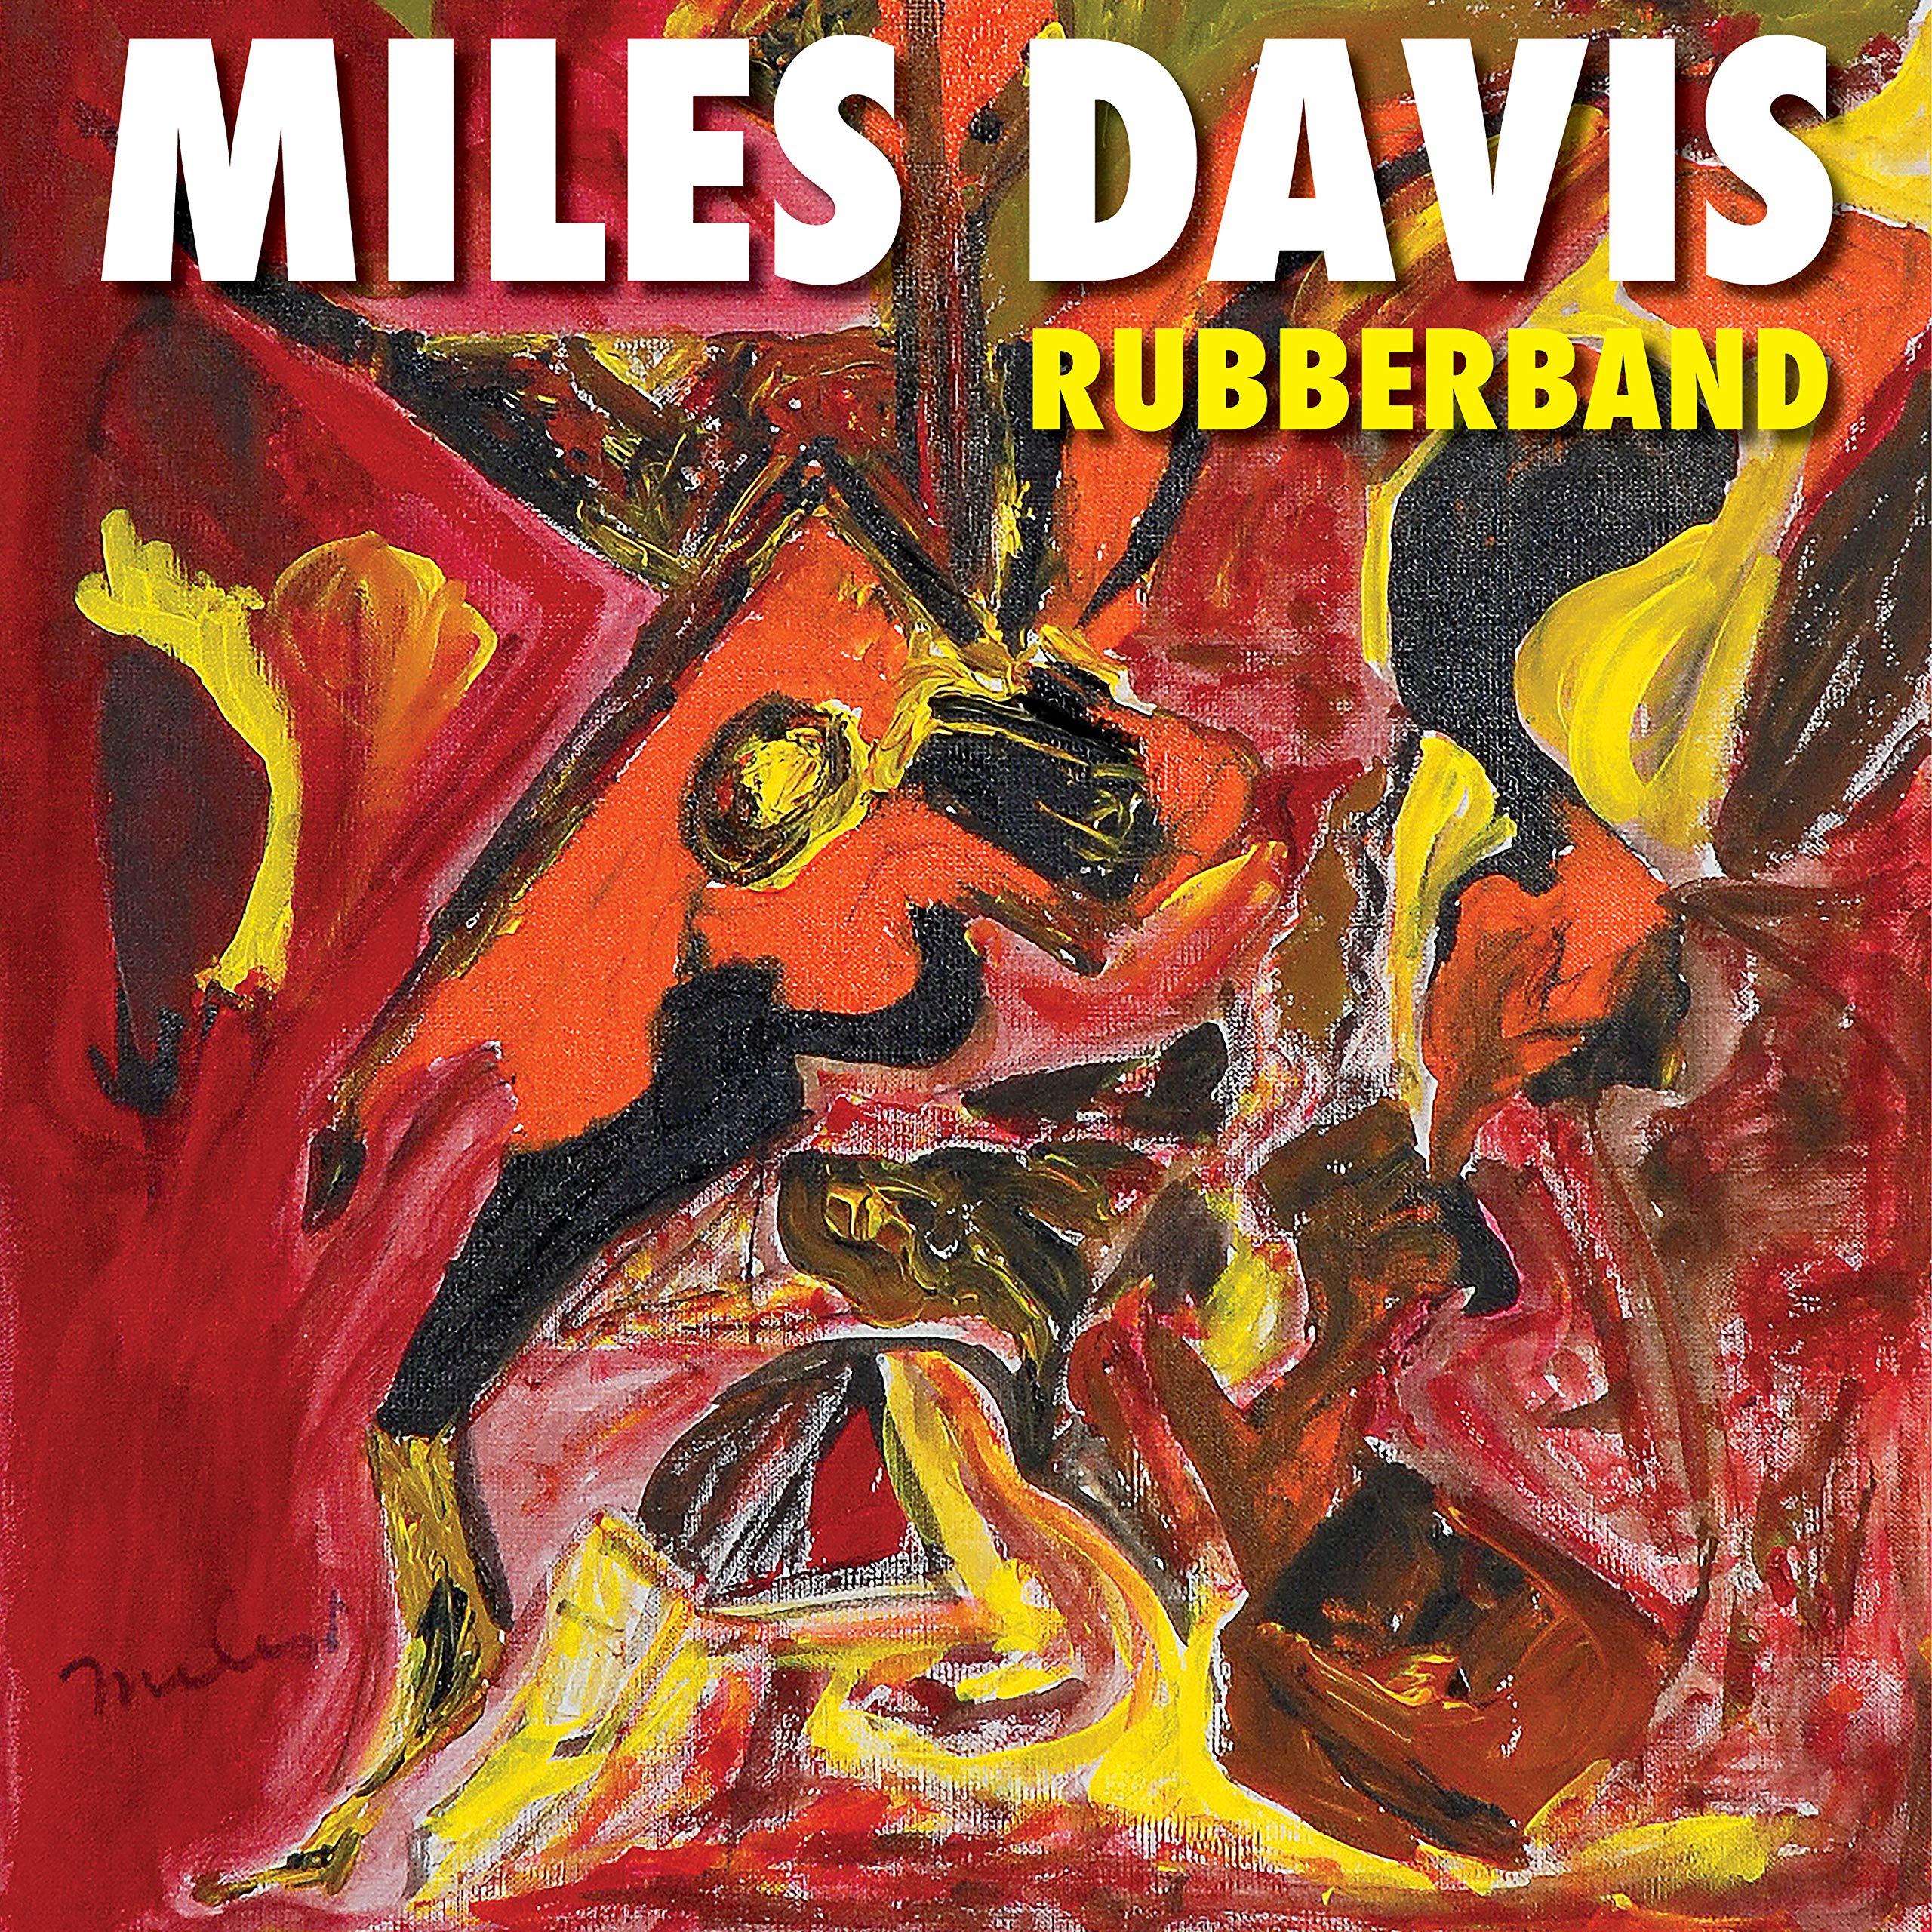 Miles Davis - Rubberband (2019) [FLAC] Download